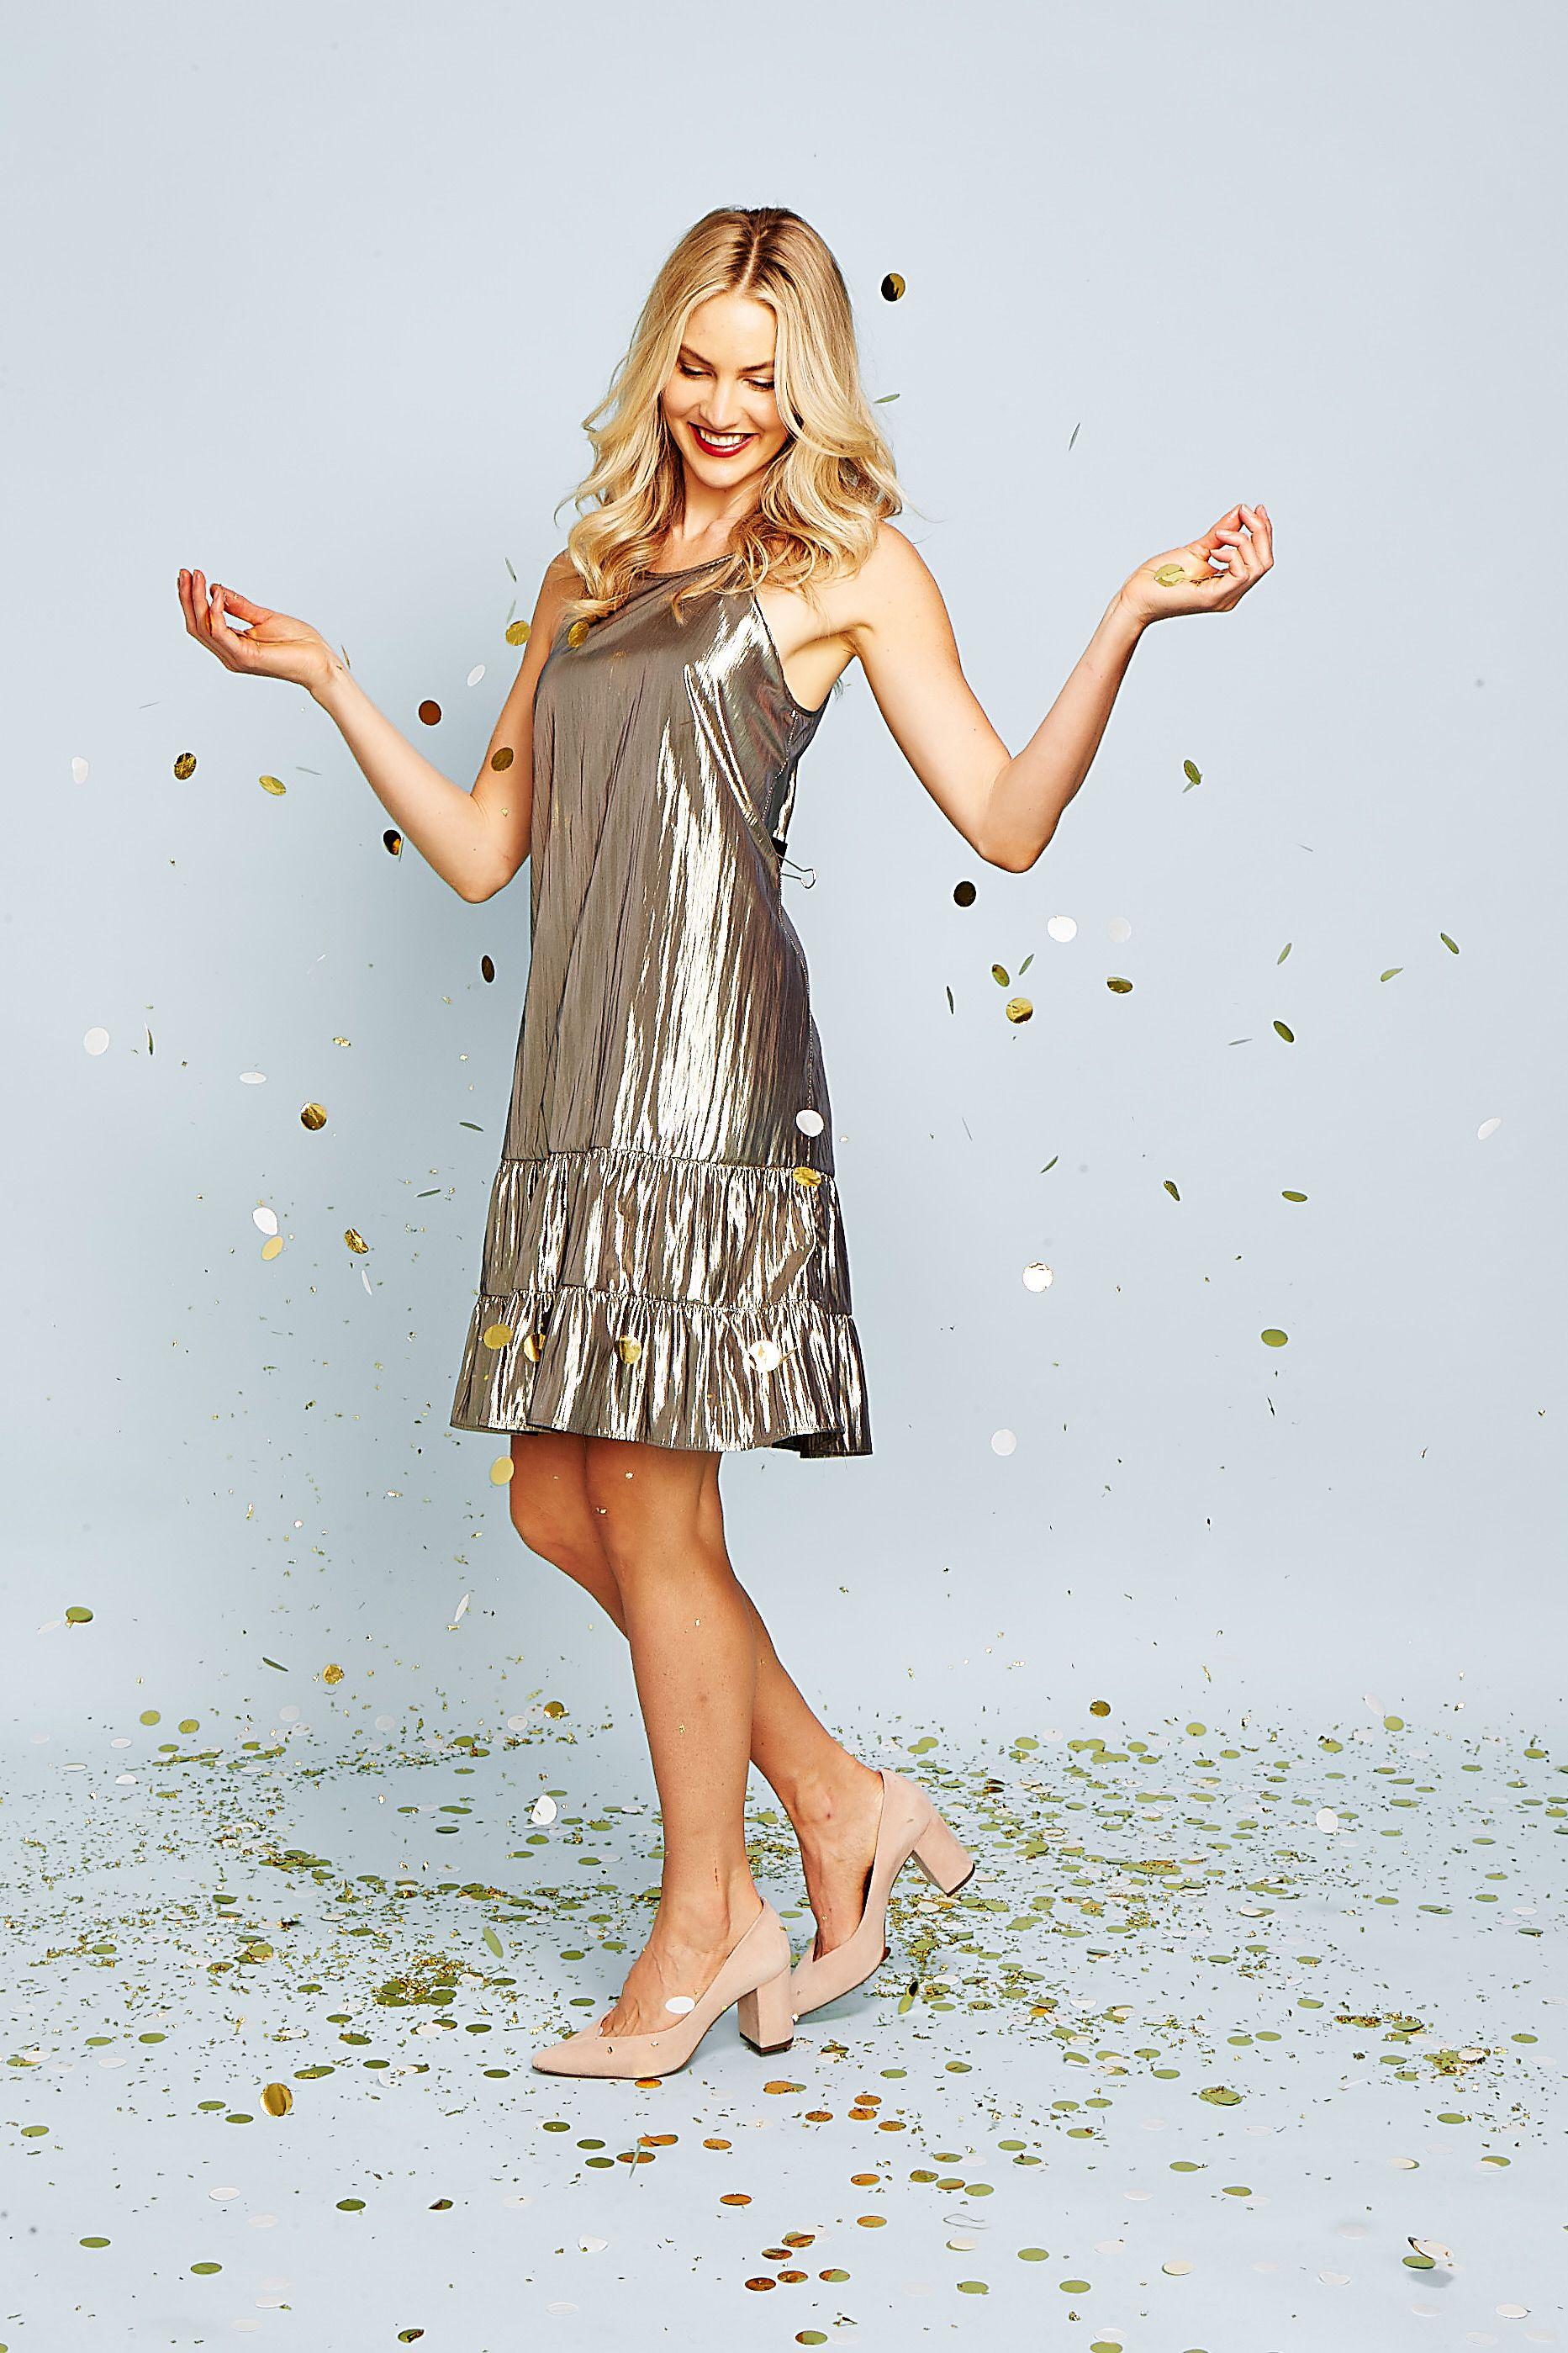 Cece Halter Neck Gold Lame Shift Dress Nordstrom Dresses Nordstrom Dresses Shift Dress [ 2798 x 1865 Pixel ]